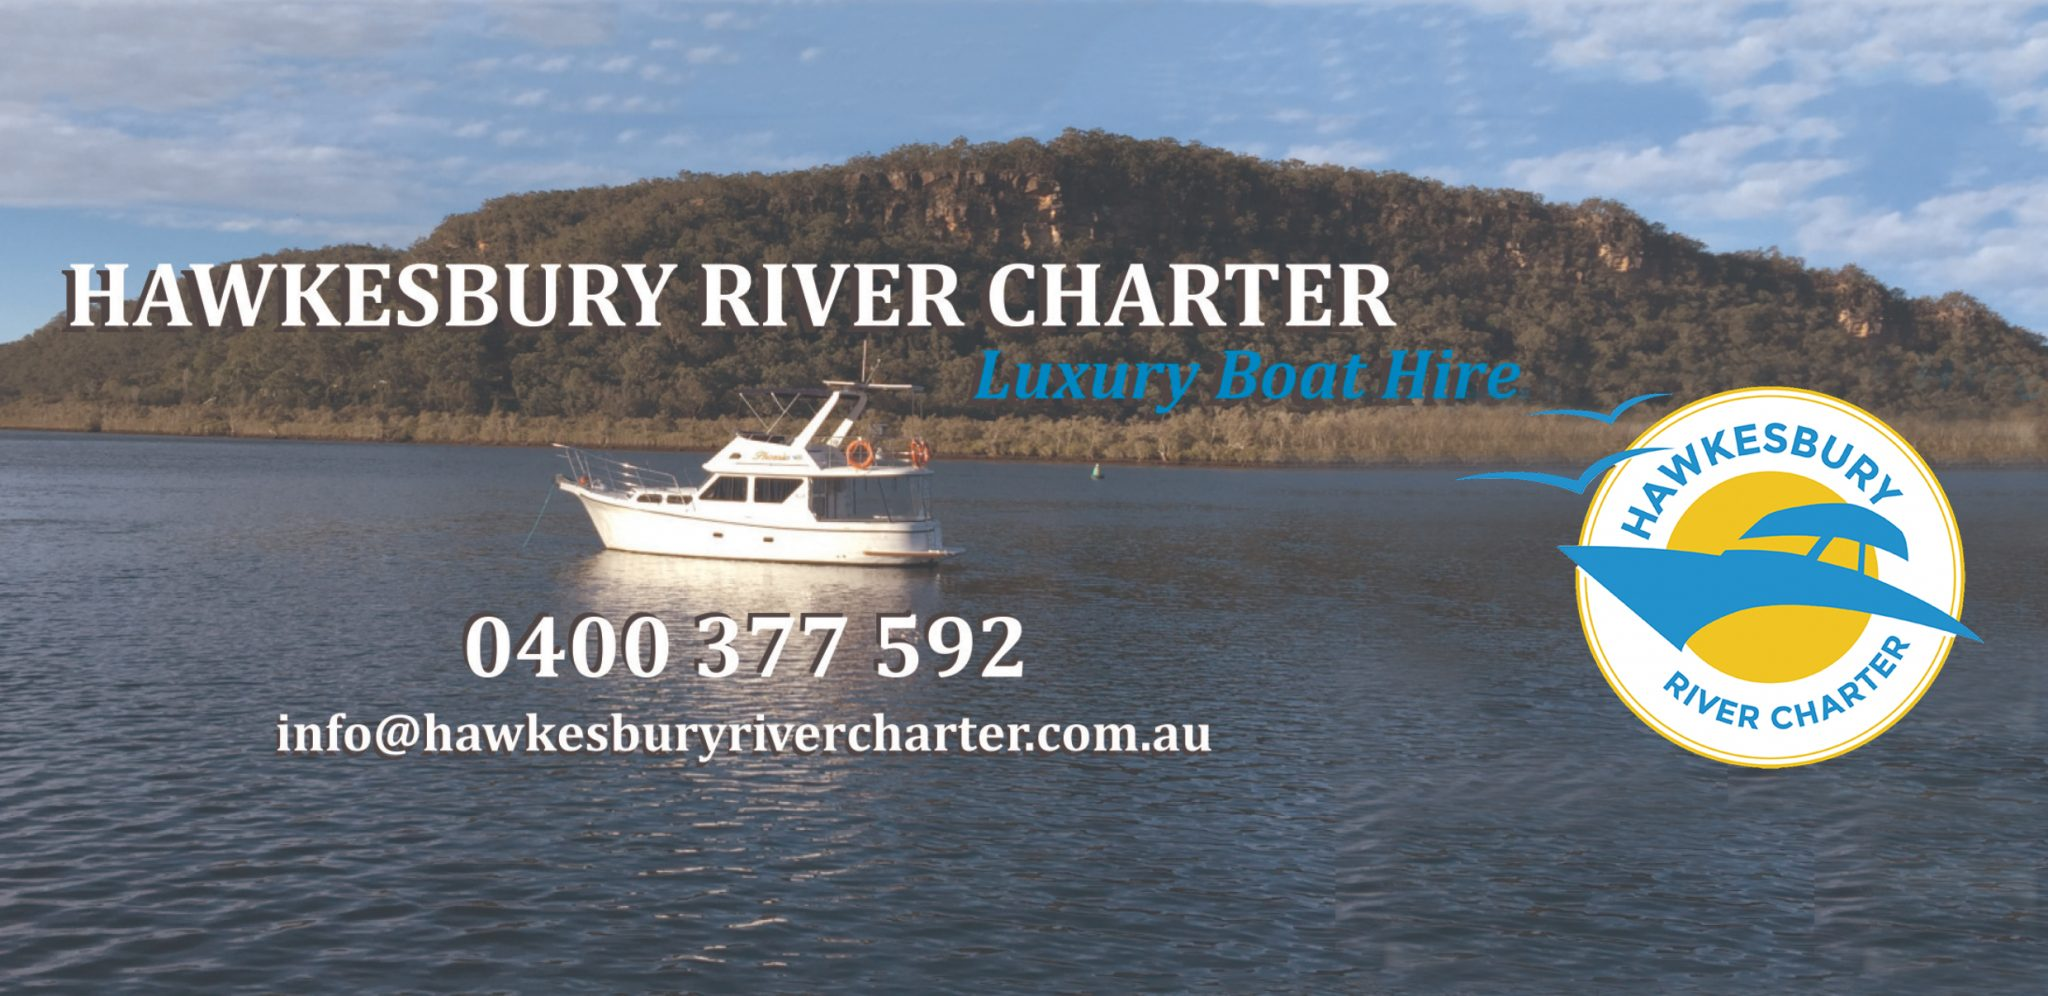 hawkesbury river charter